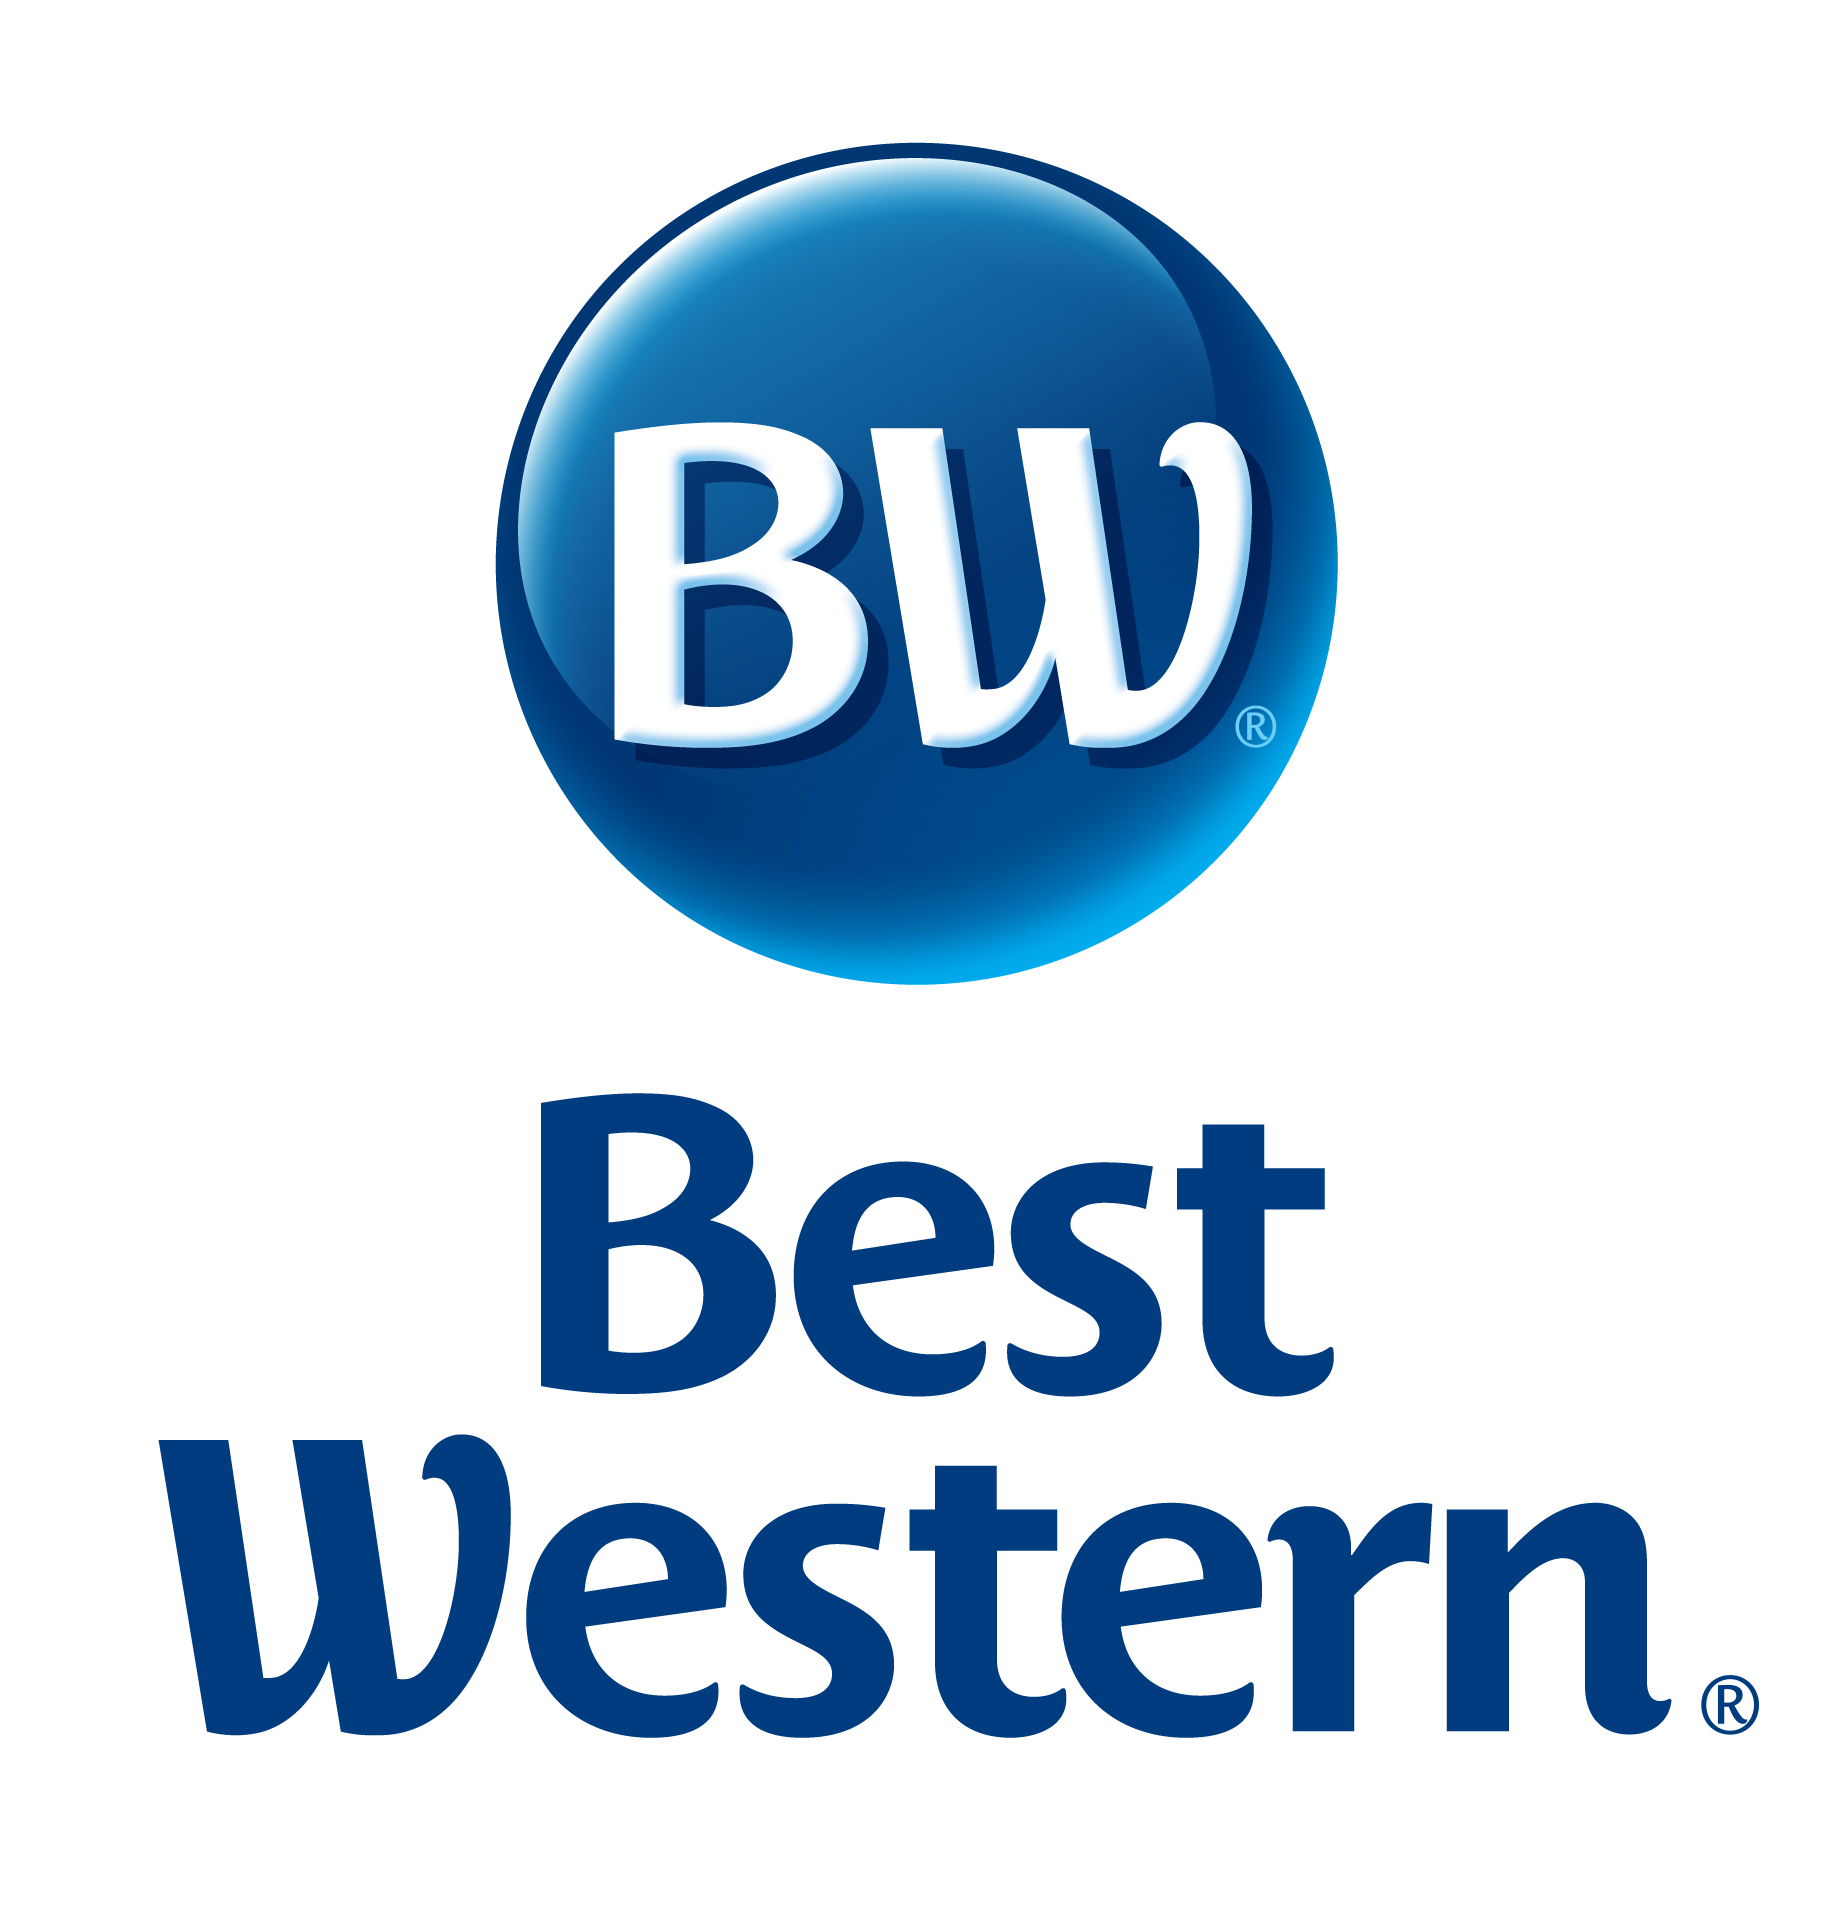 «BEST WESTERN» Ресторан при отеле